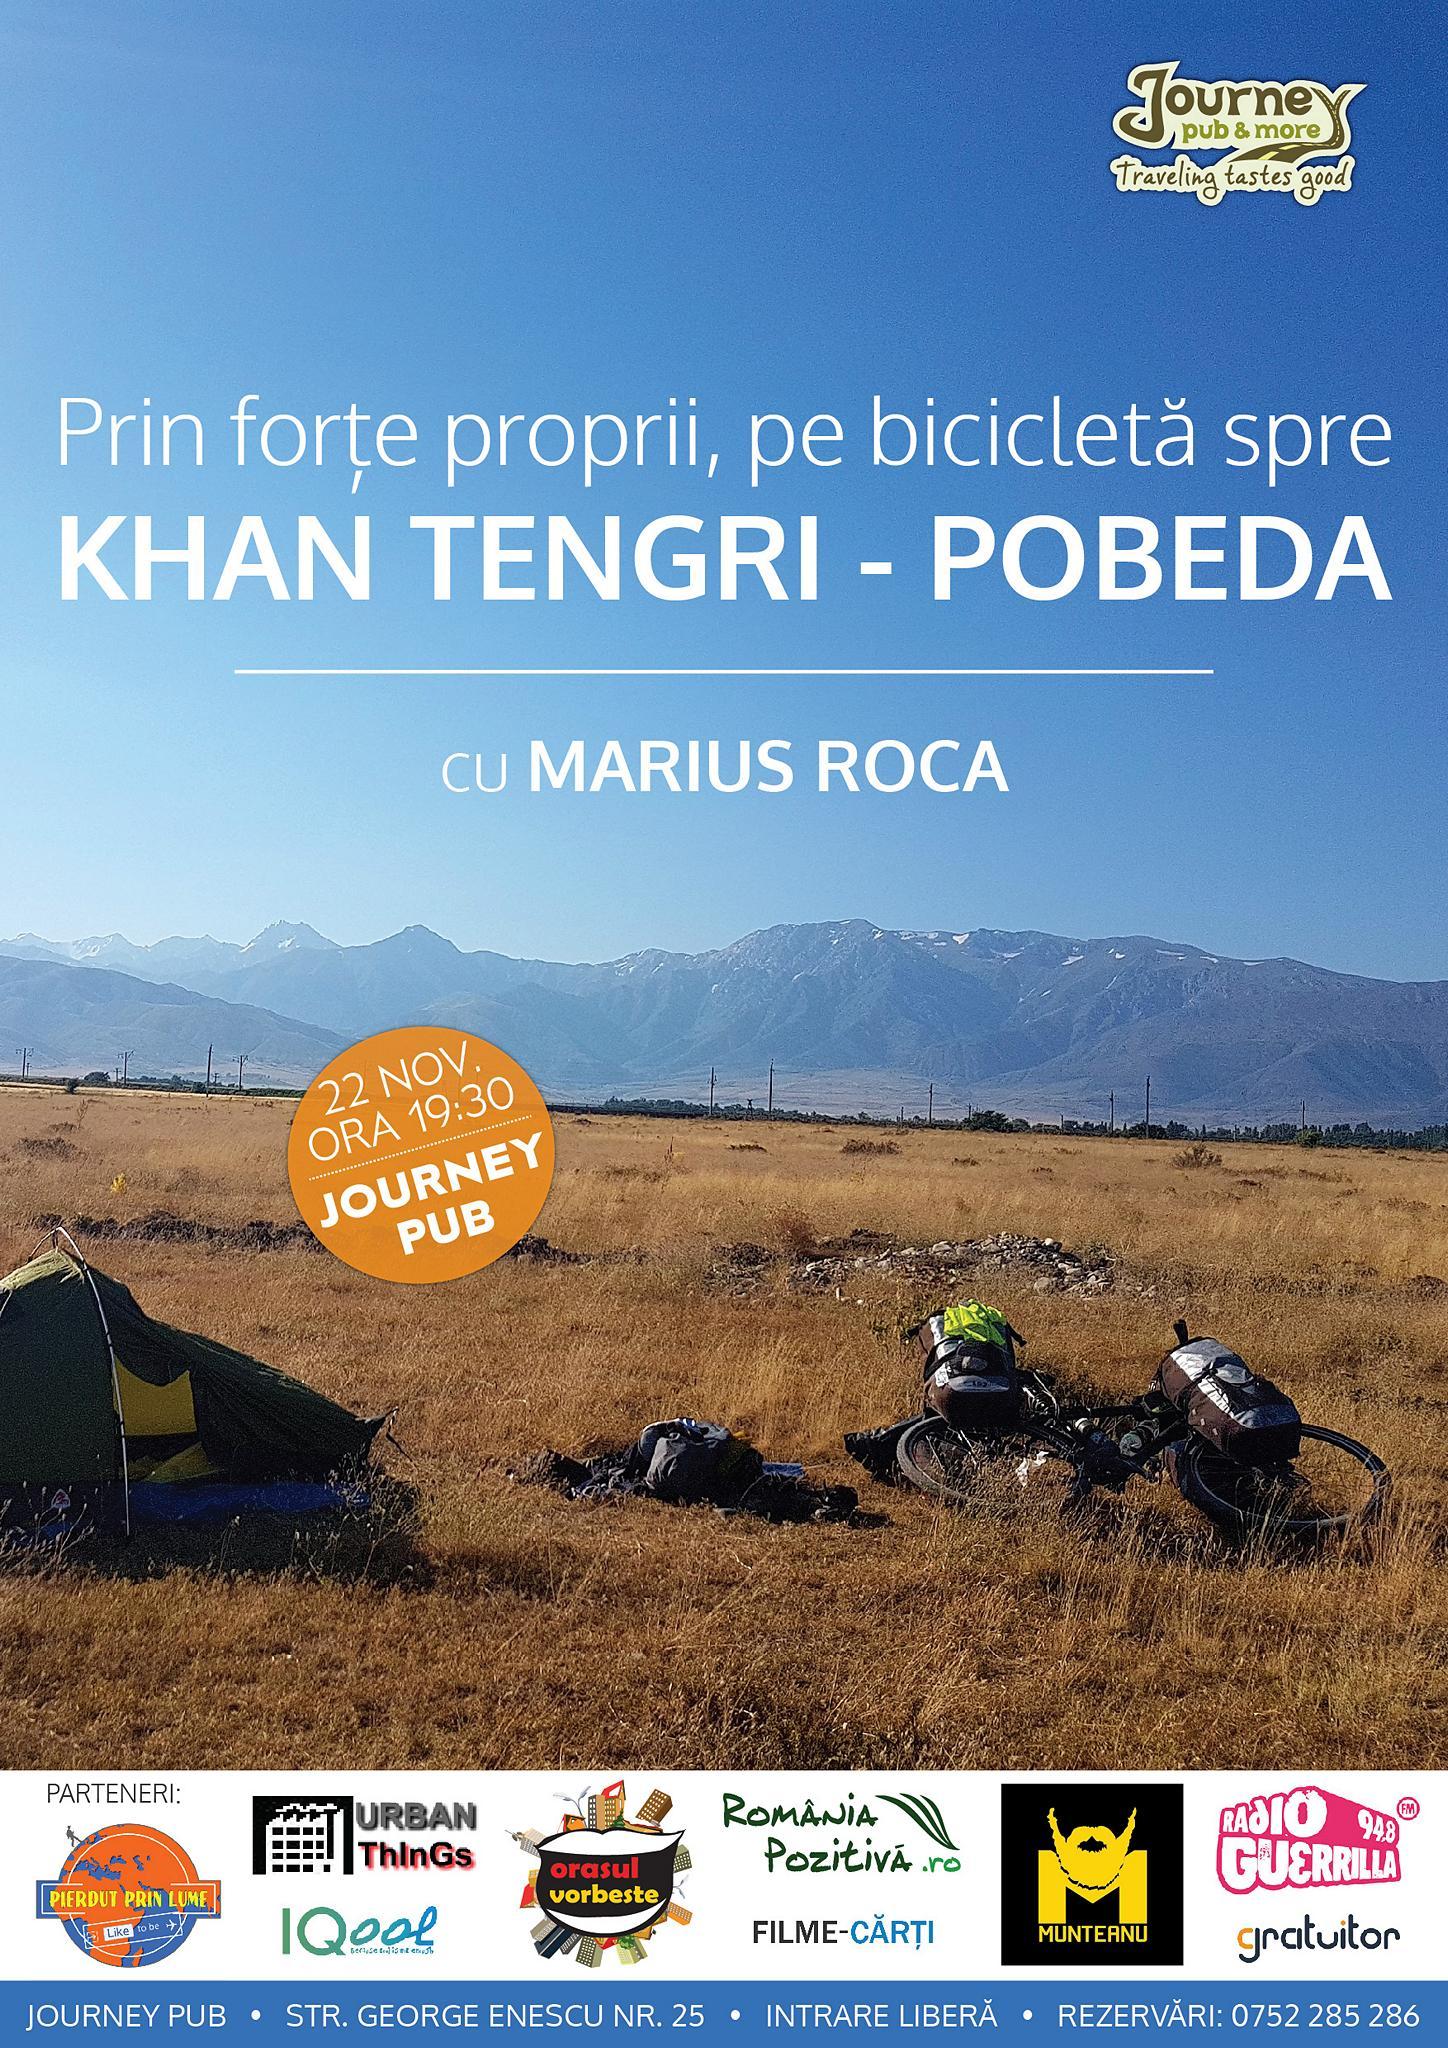 Prin forte proprii, pe bicicleta, spre Khan Tengri-Pobeda, cu Marius Roca